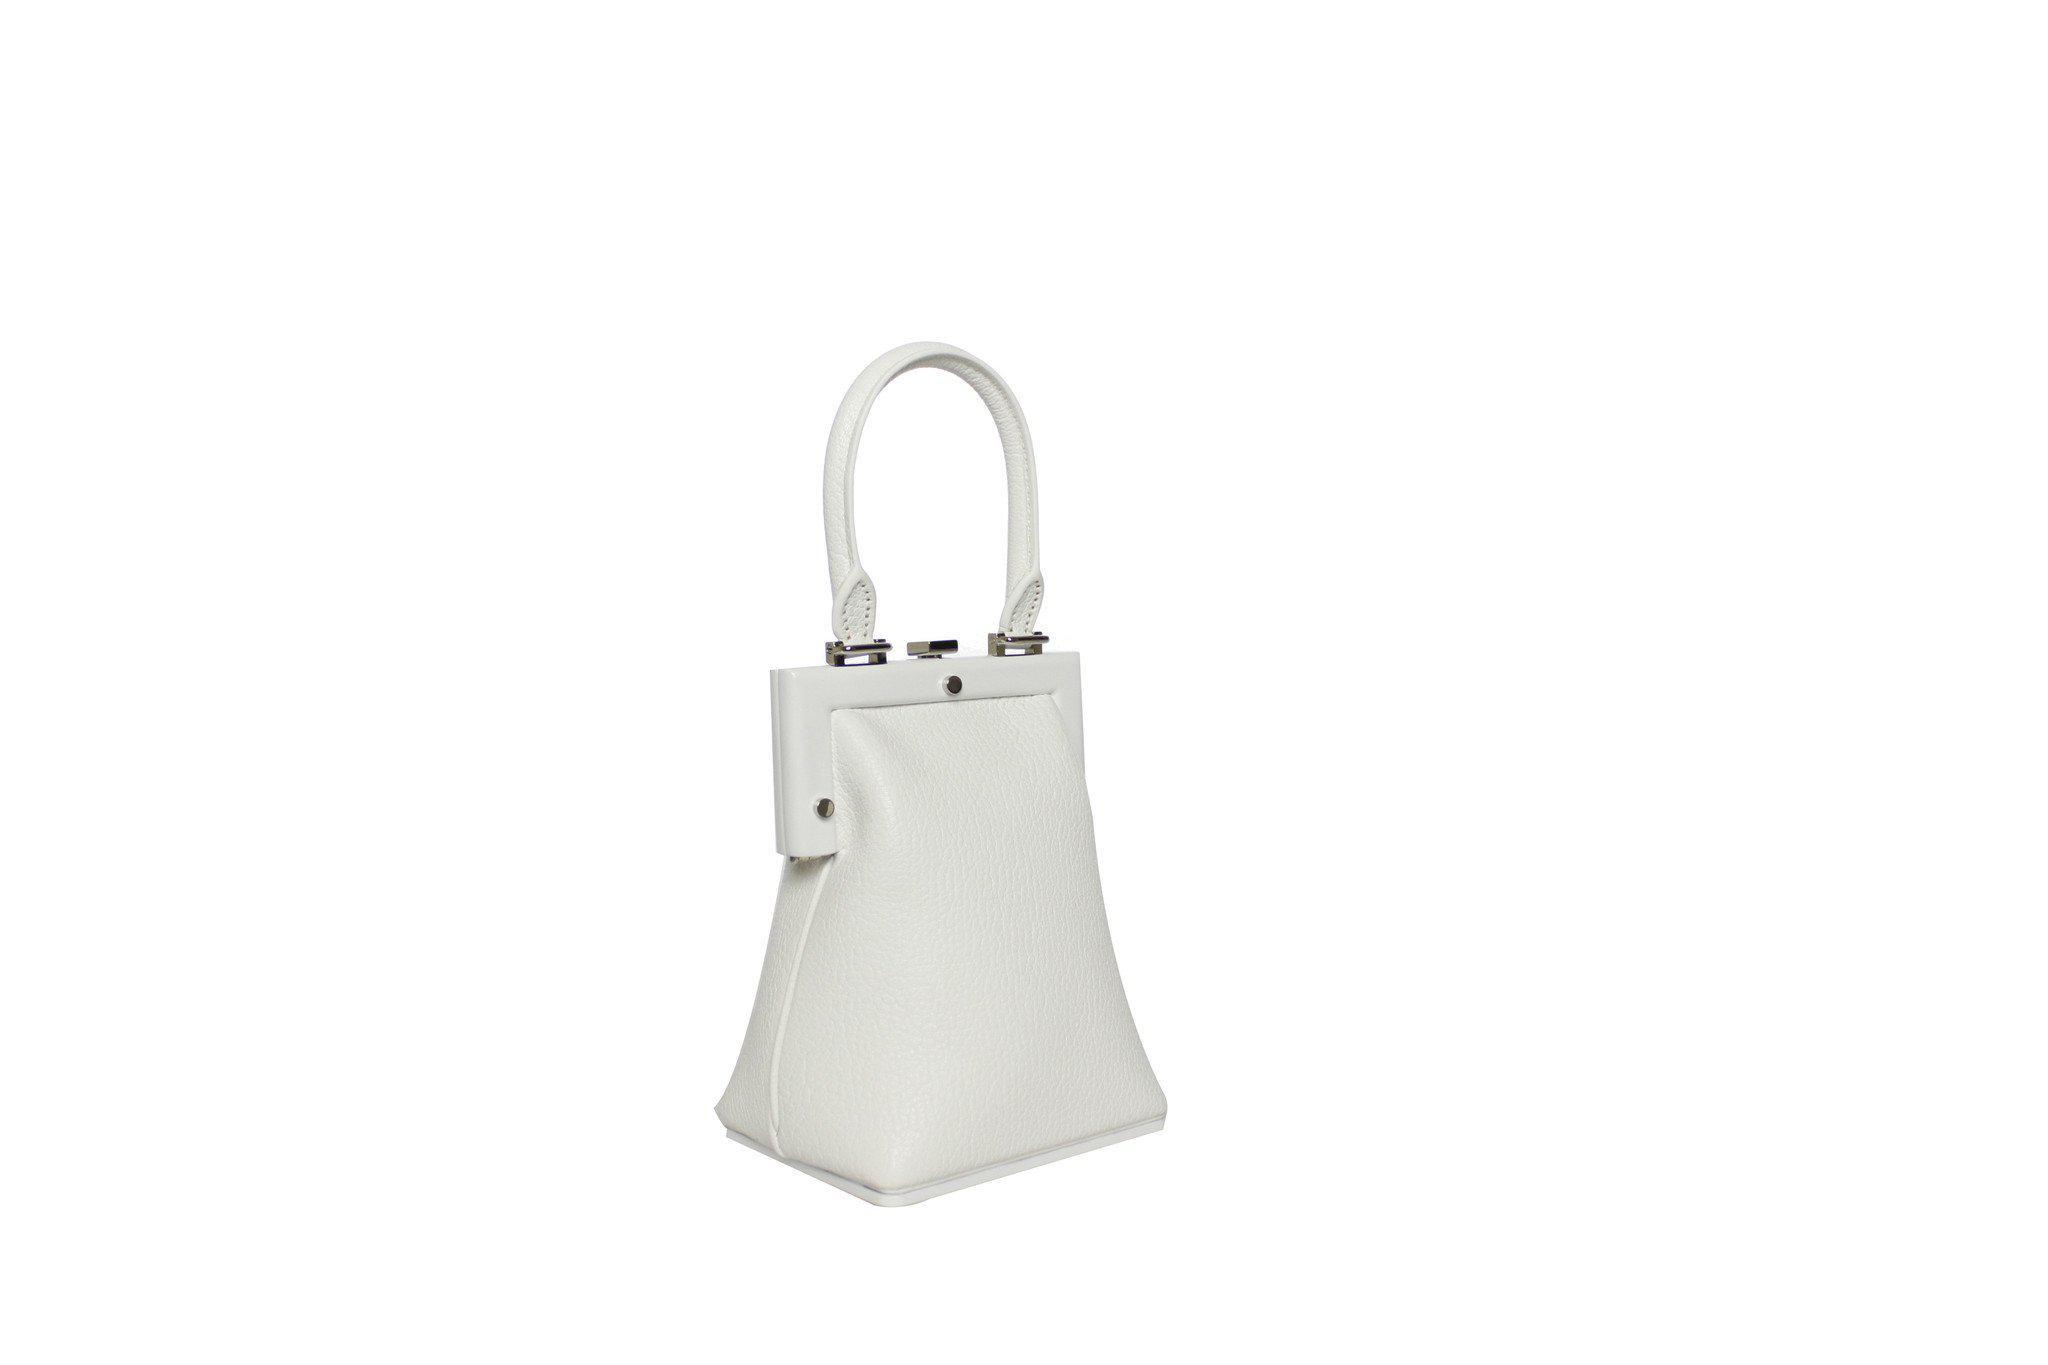 e3603f1586 Lyst - Perrin Paris La Minaudière in White